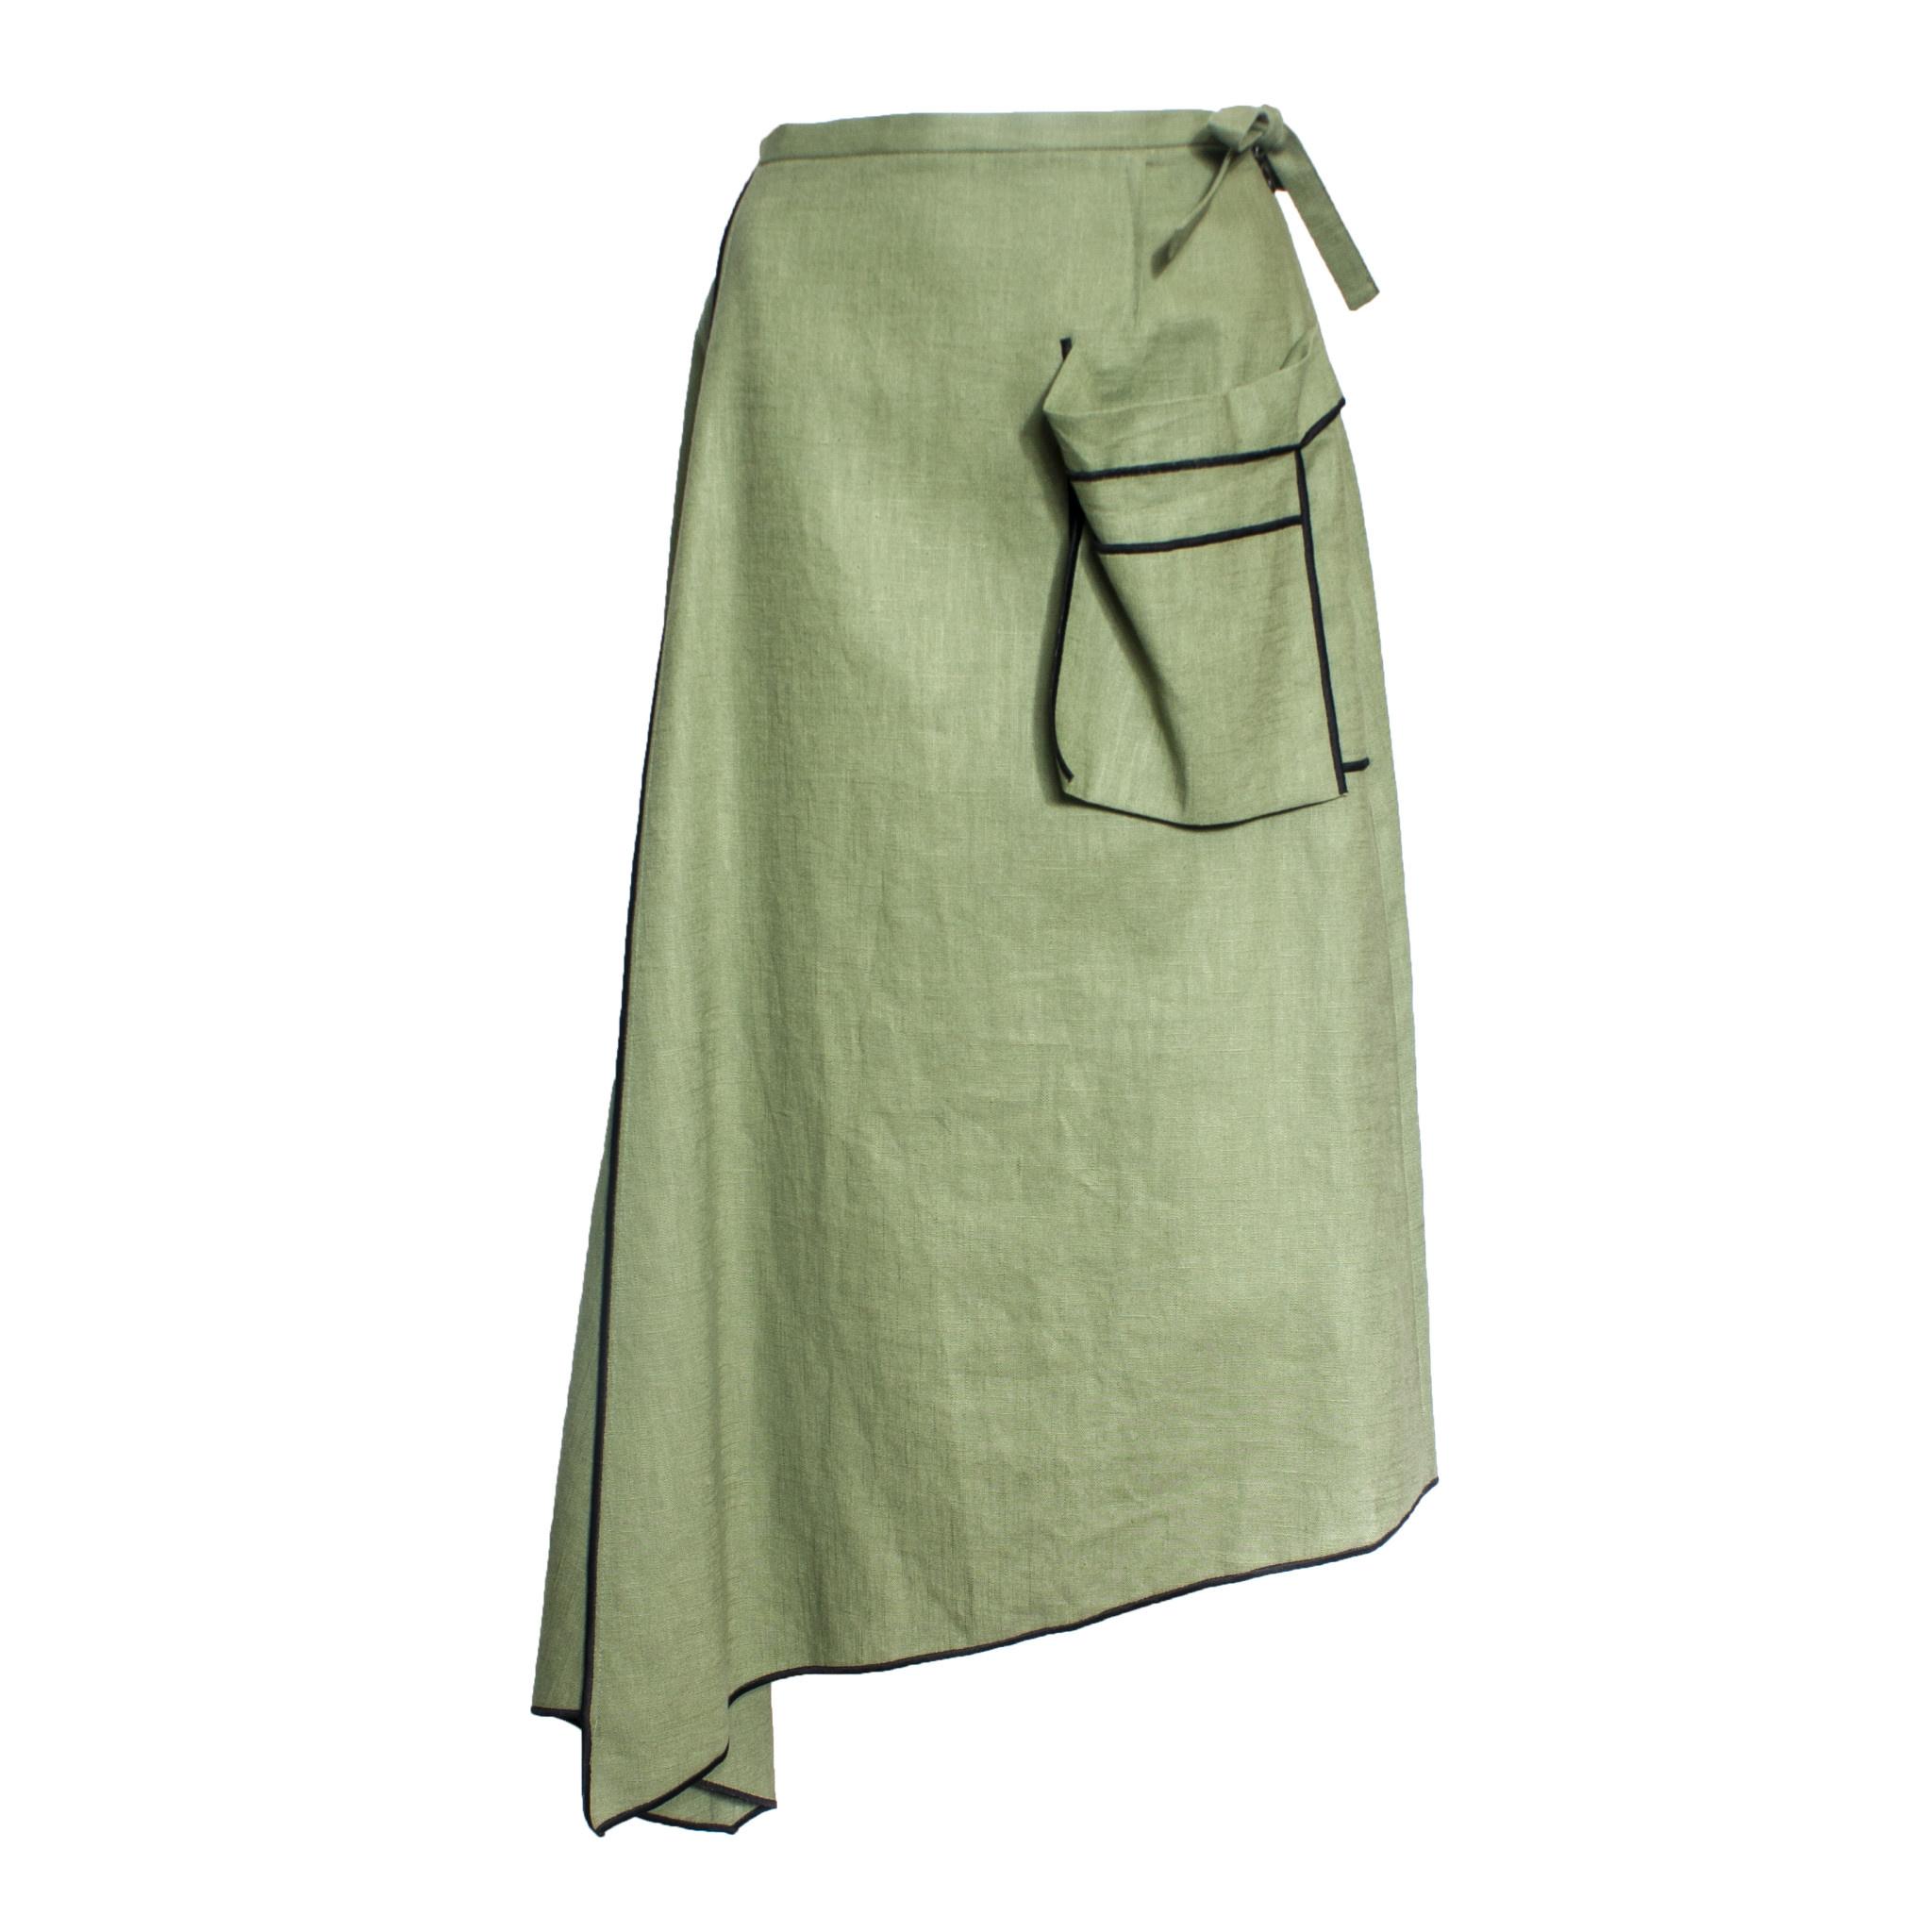 Xenia Xenia Kive Pocket Skirt - Olive